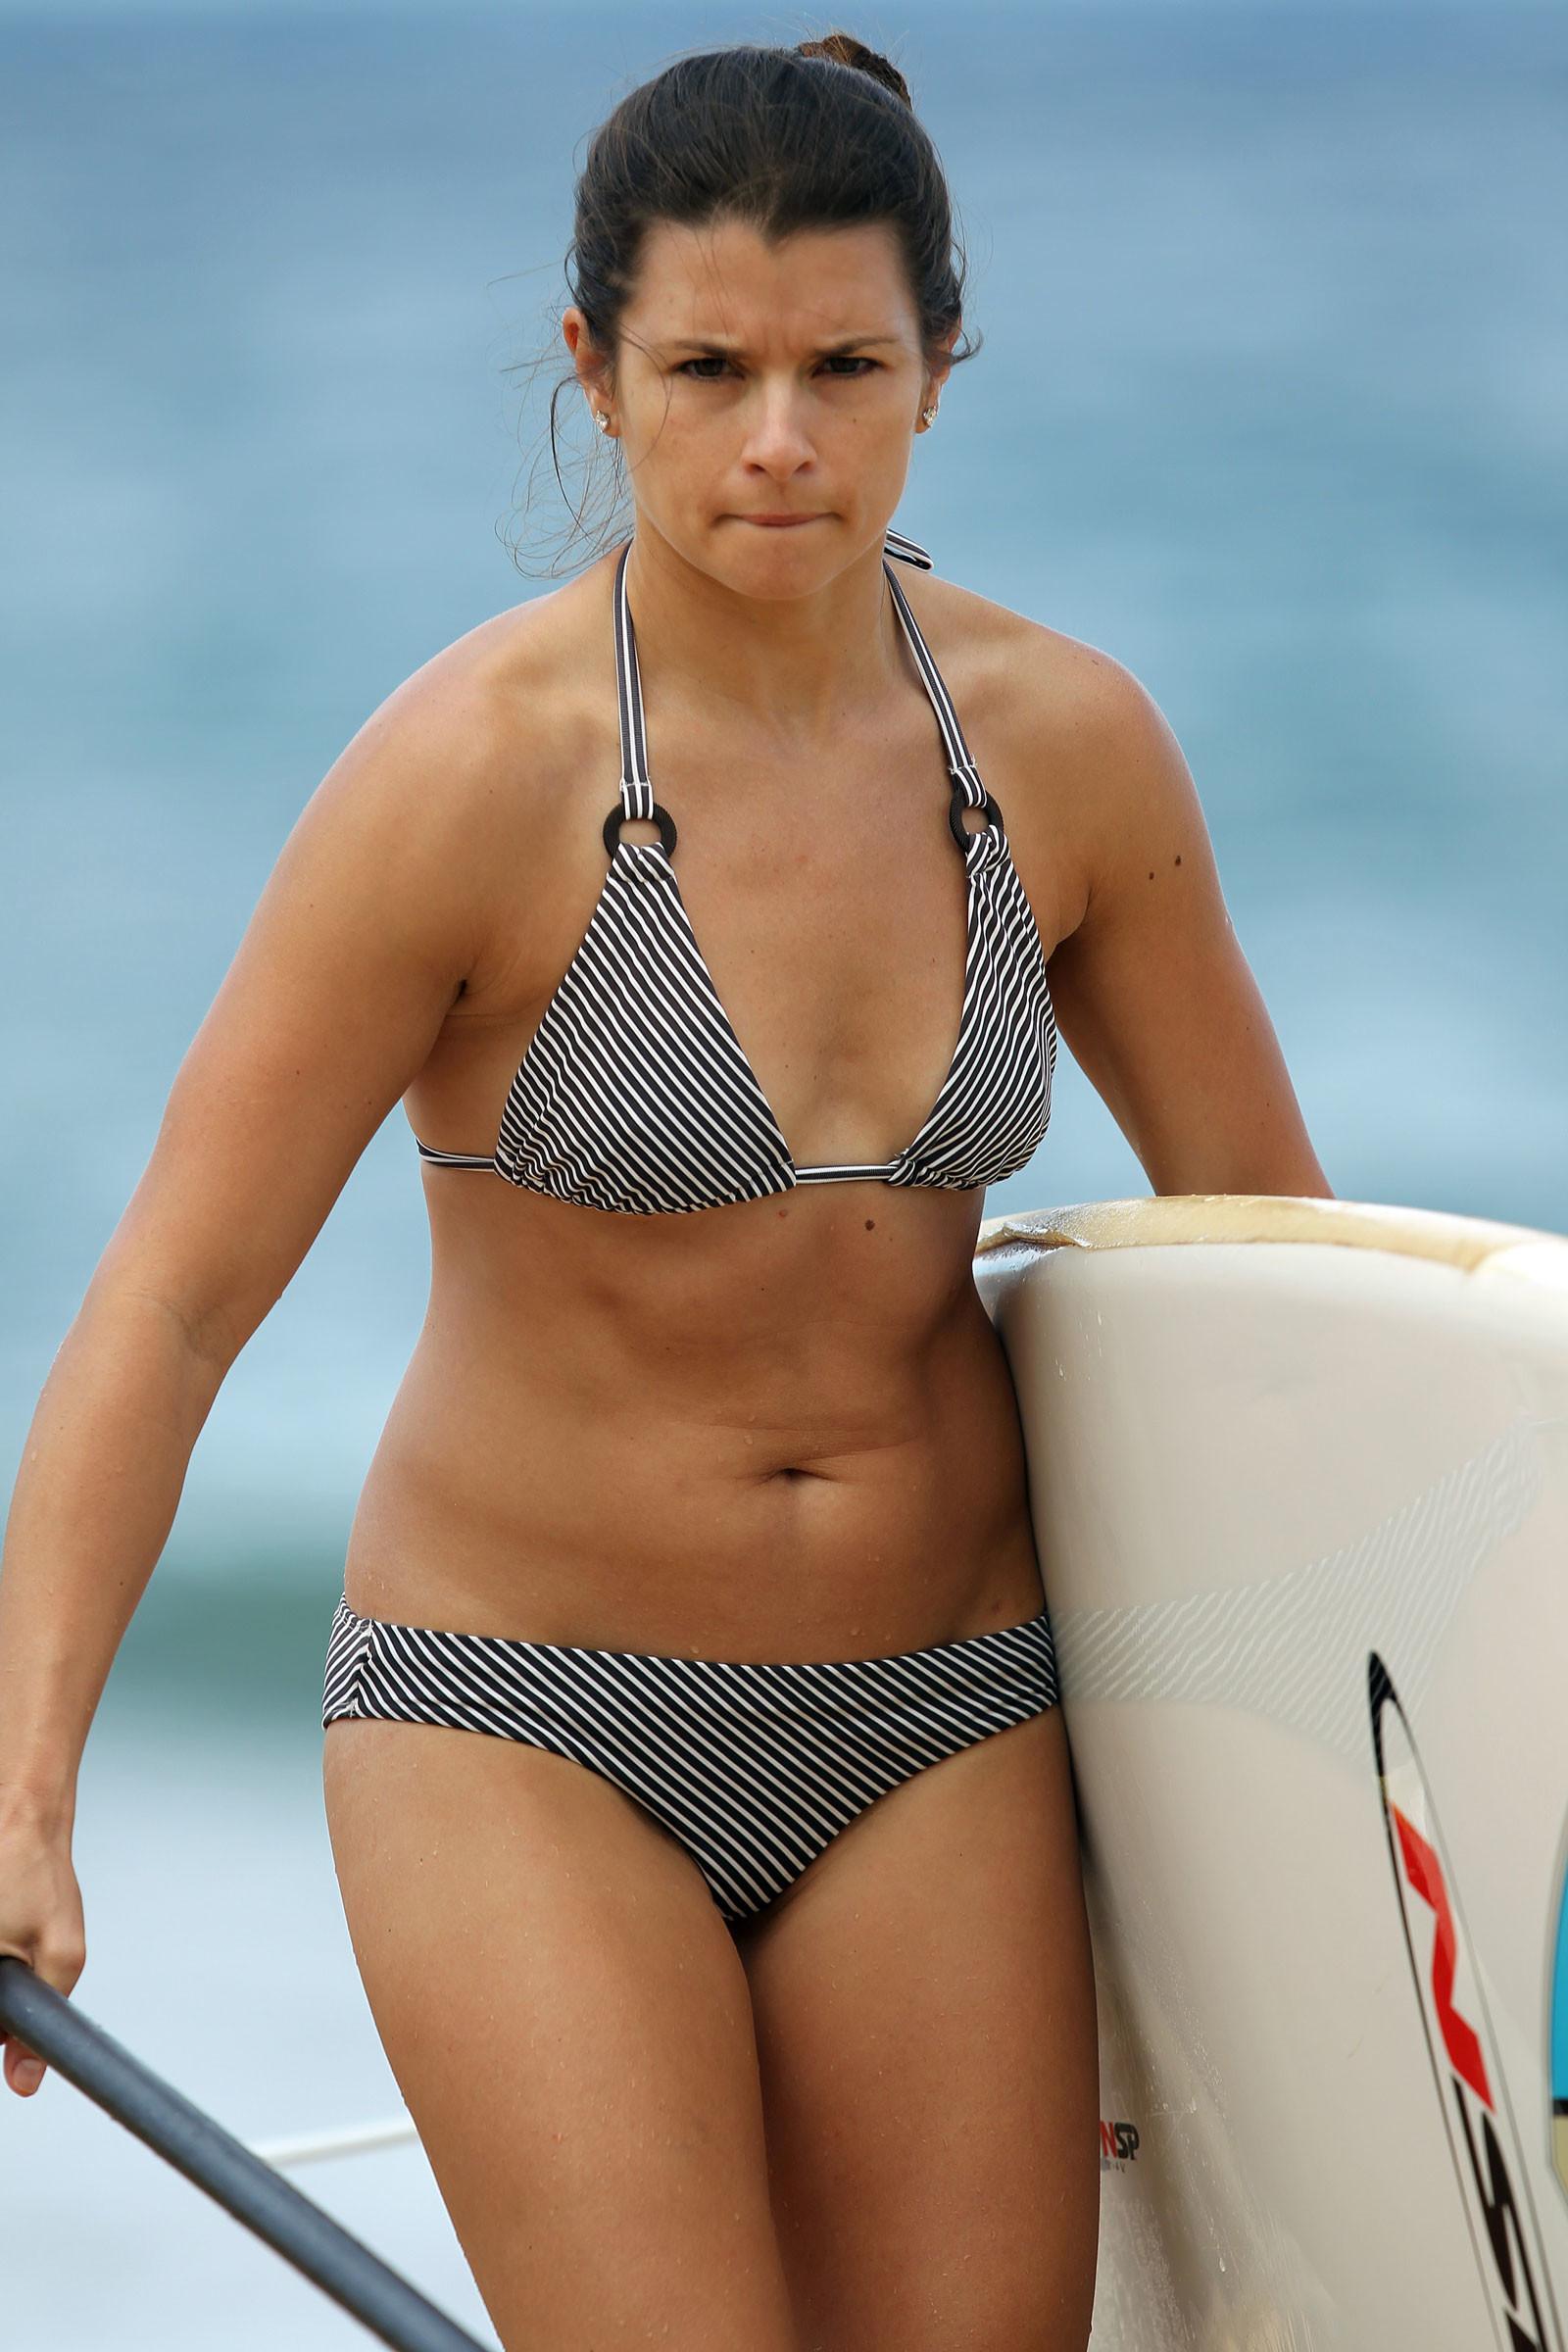 Danica Patrick Bikini Candids in Hawaii (81 Photos) Danica Patrick